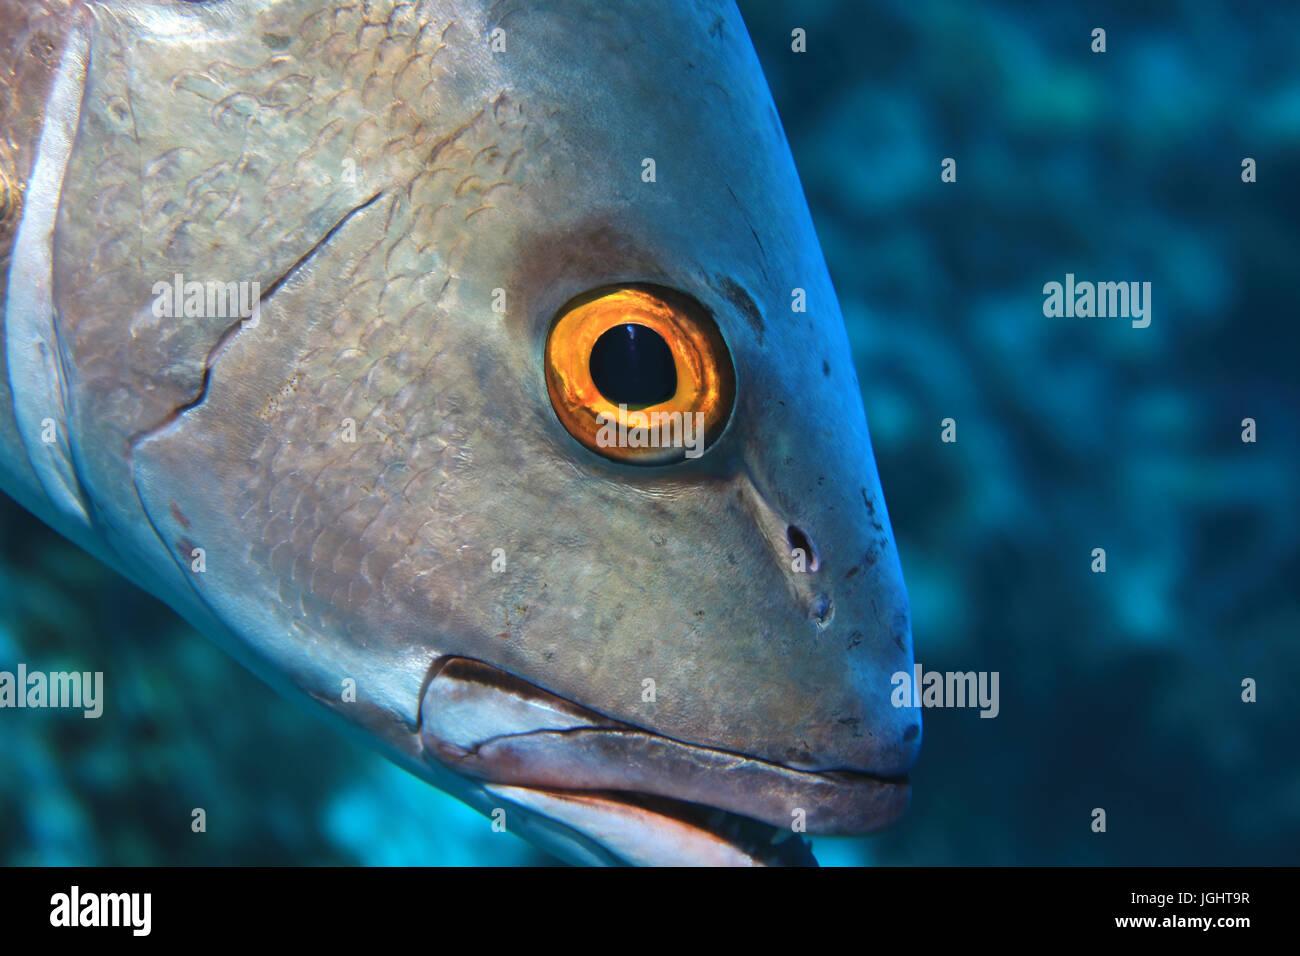 Eye of two-spot red snapper fish (Lutjanus bohar) underwater in the indian ocean - Stock Image